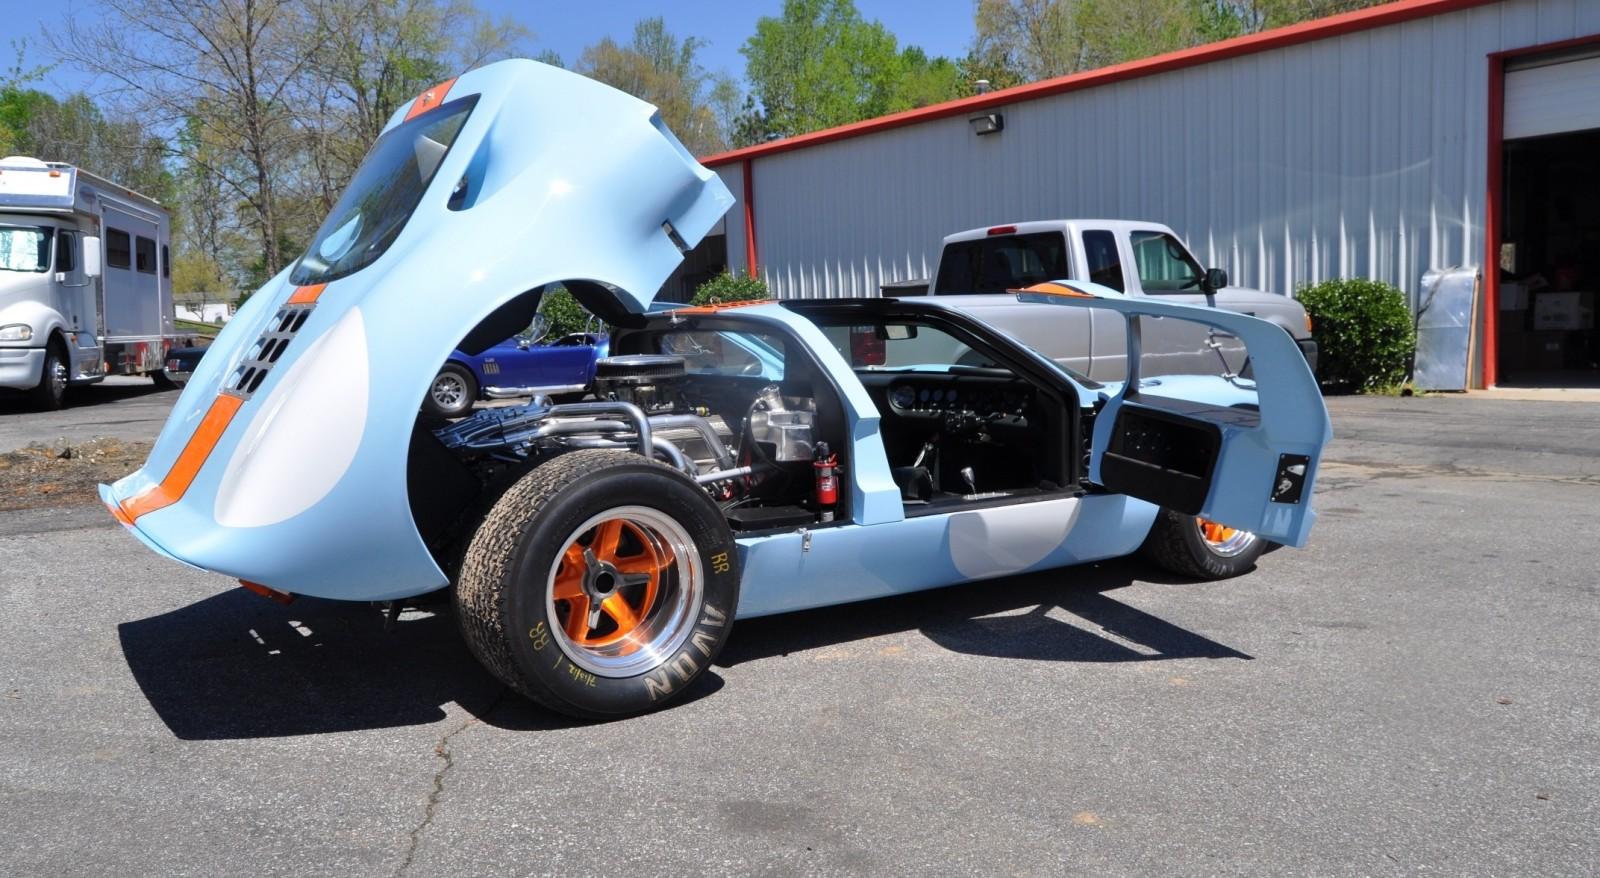 2014 Superformance GT40 Mark I - MEGA Photo Shoot and Ride-Along Videos 74